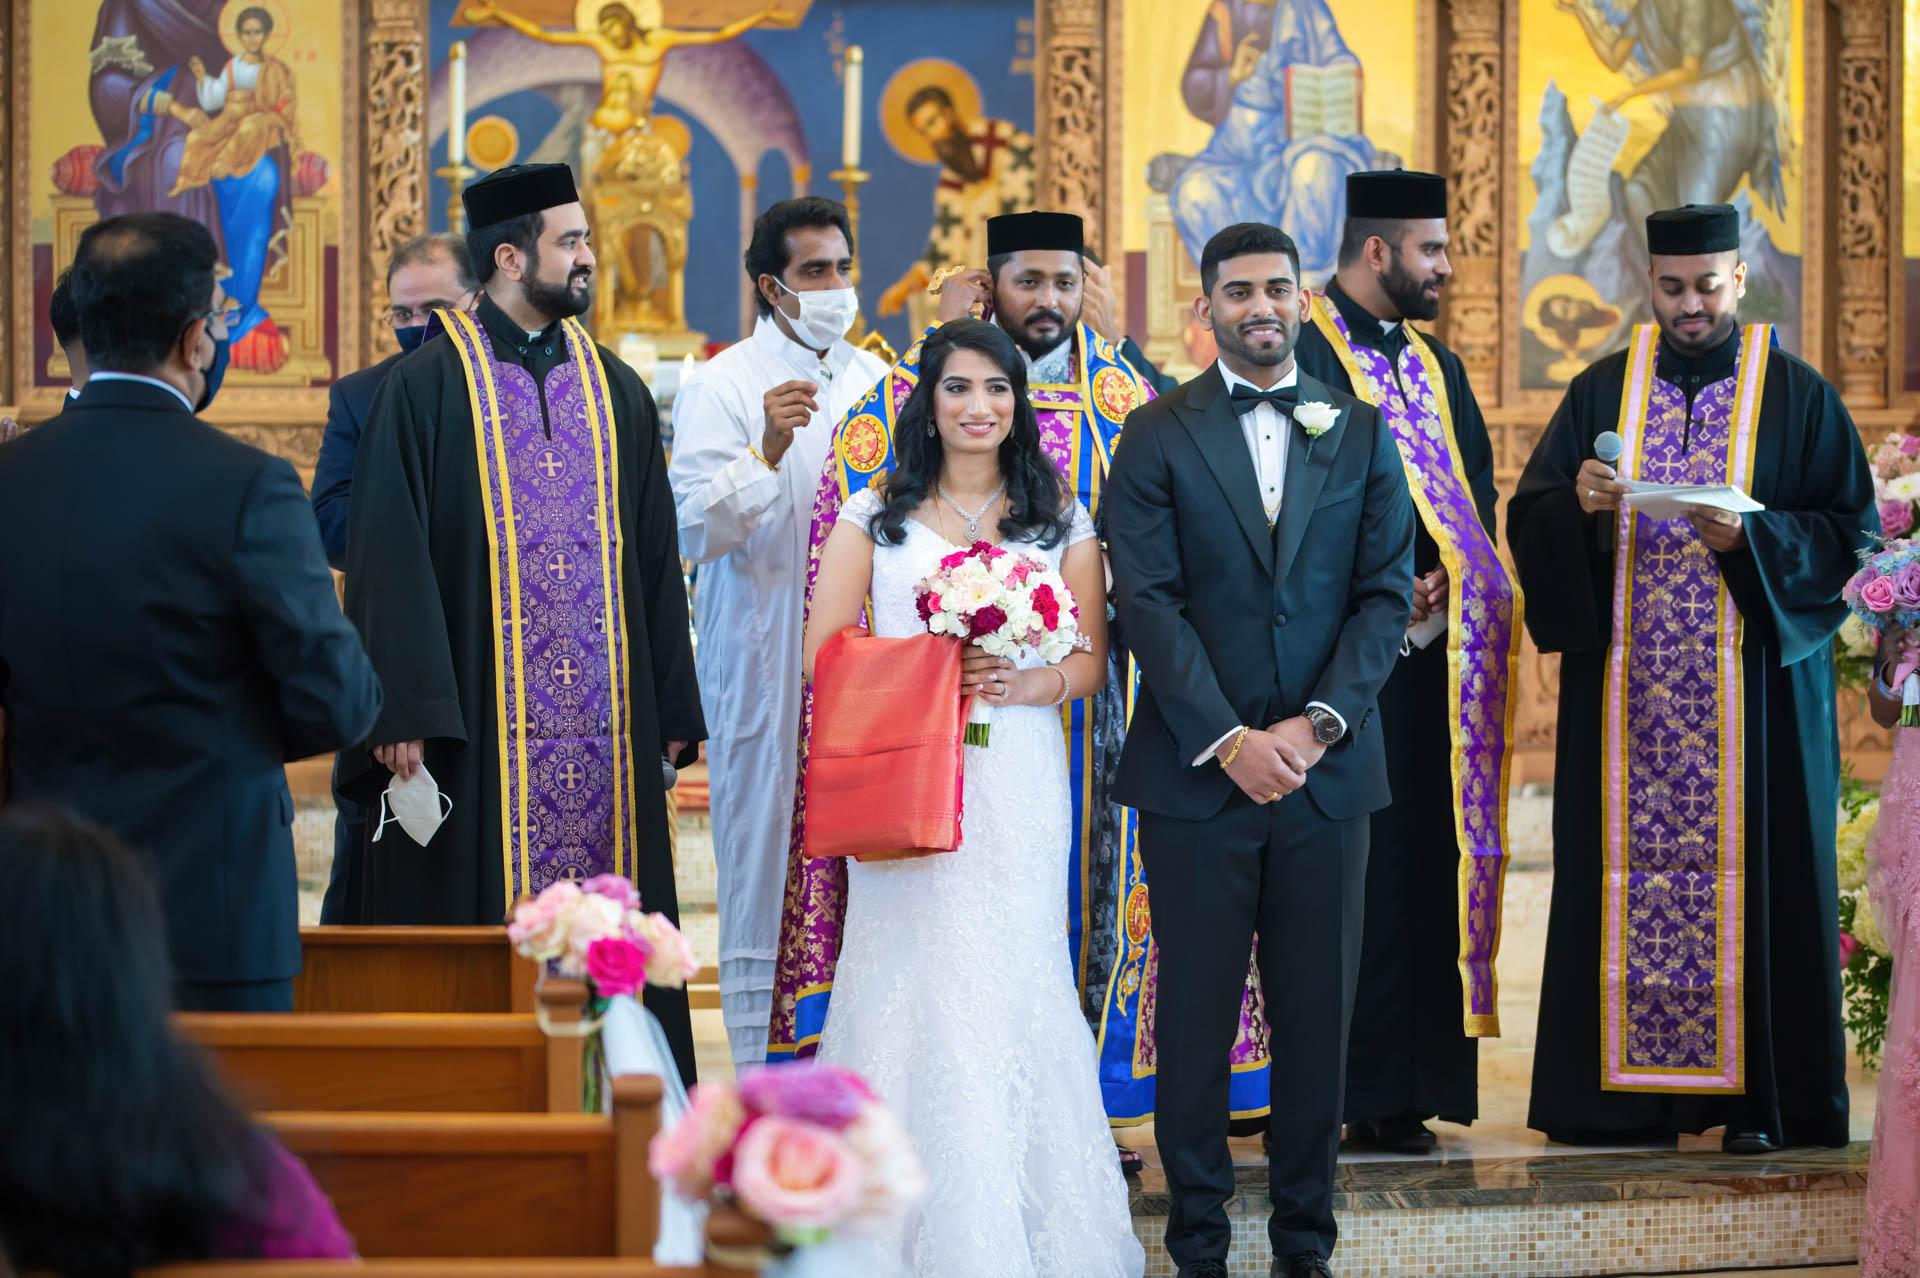 WESTMOUNT COUNTRY CLUB INDIAN WEDDING 17